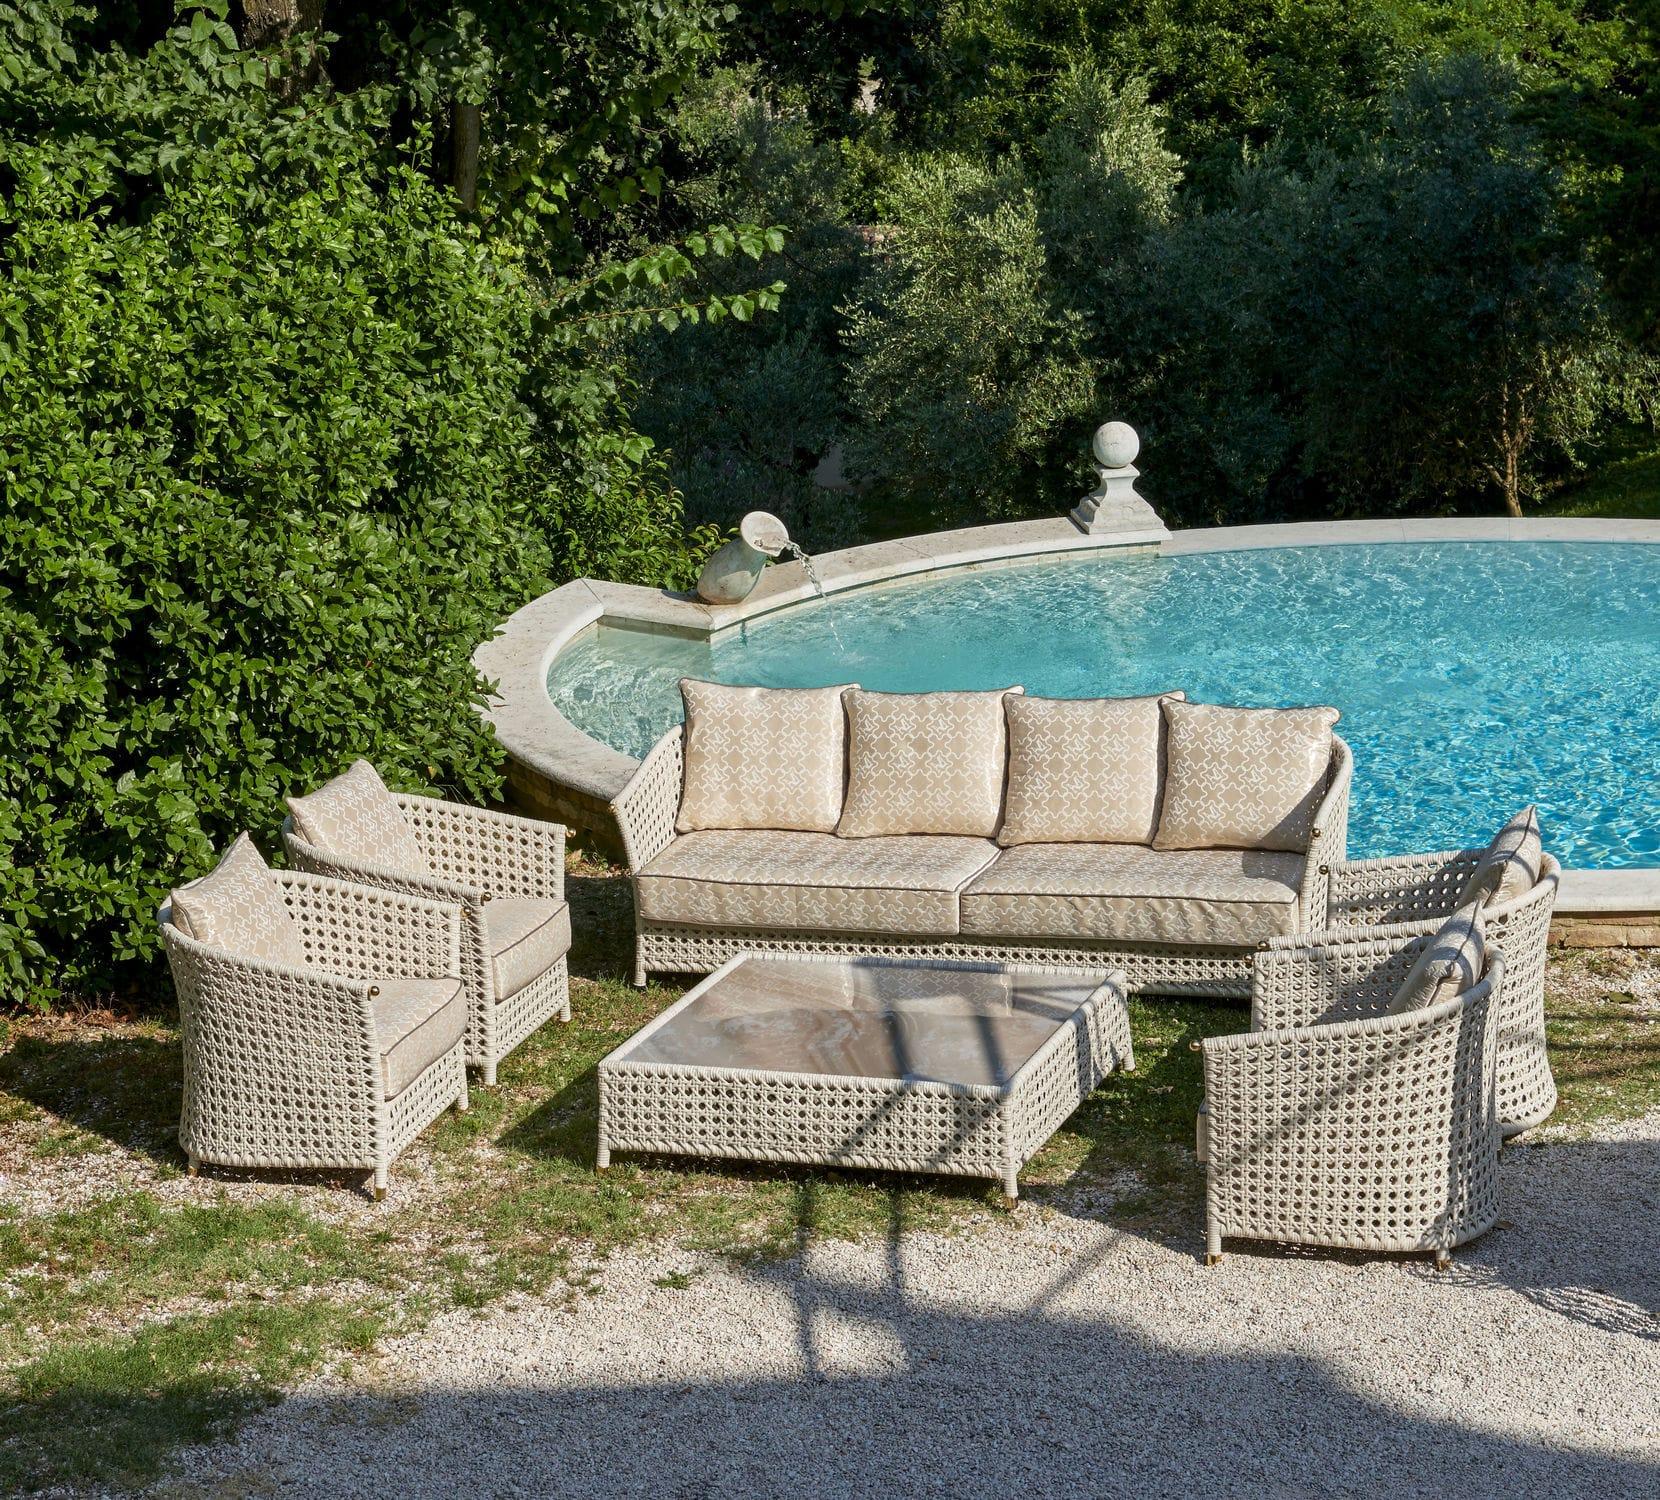 Traditional sofa - WEZEN - Samuele Mazza by DFN srl - garden